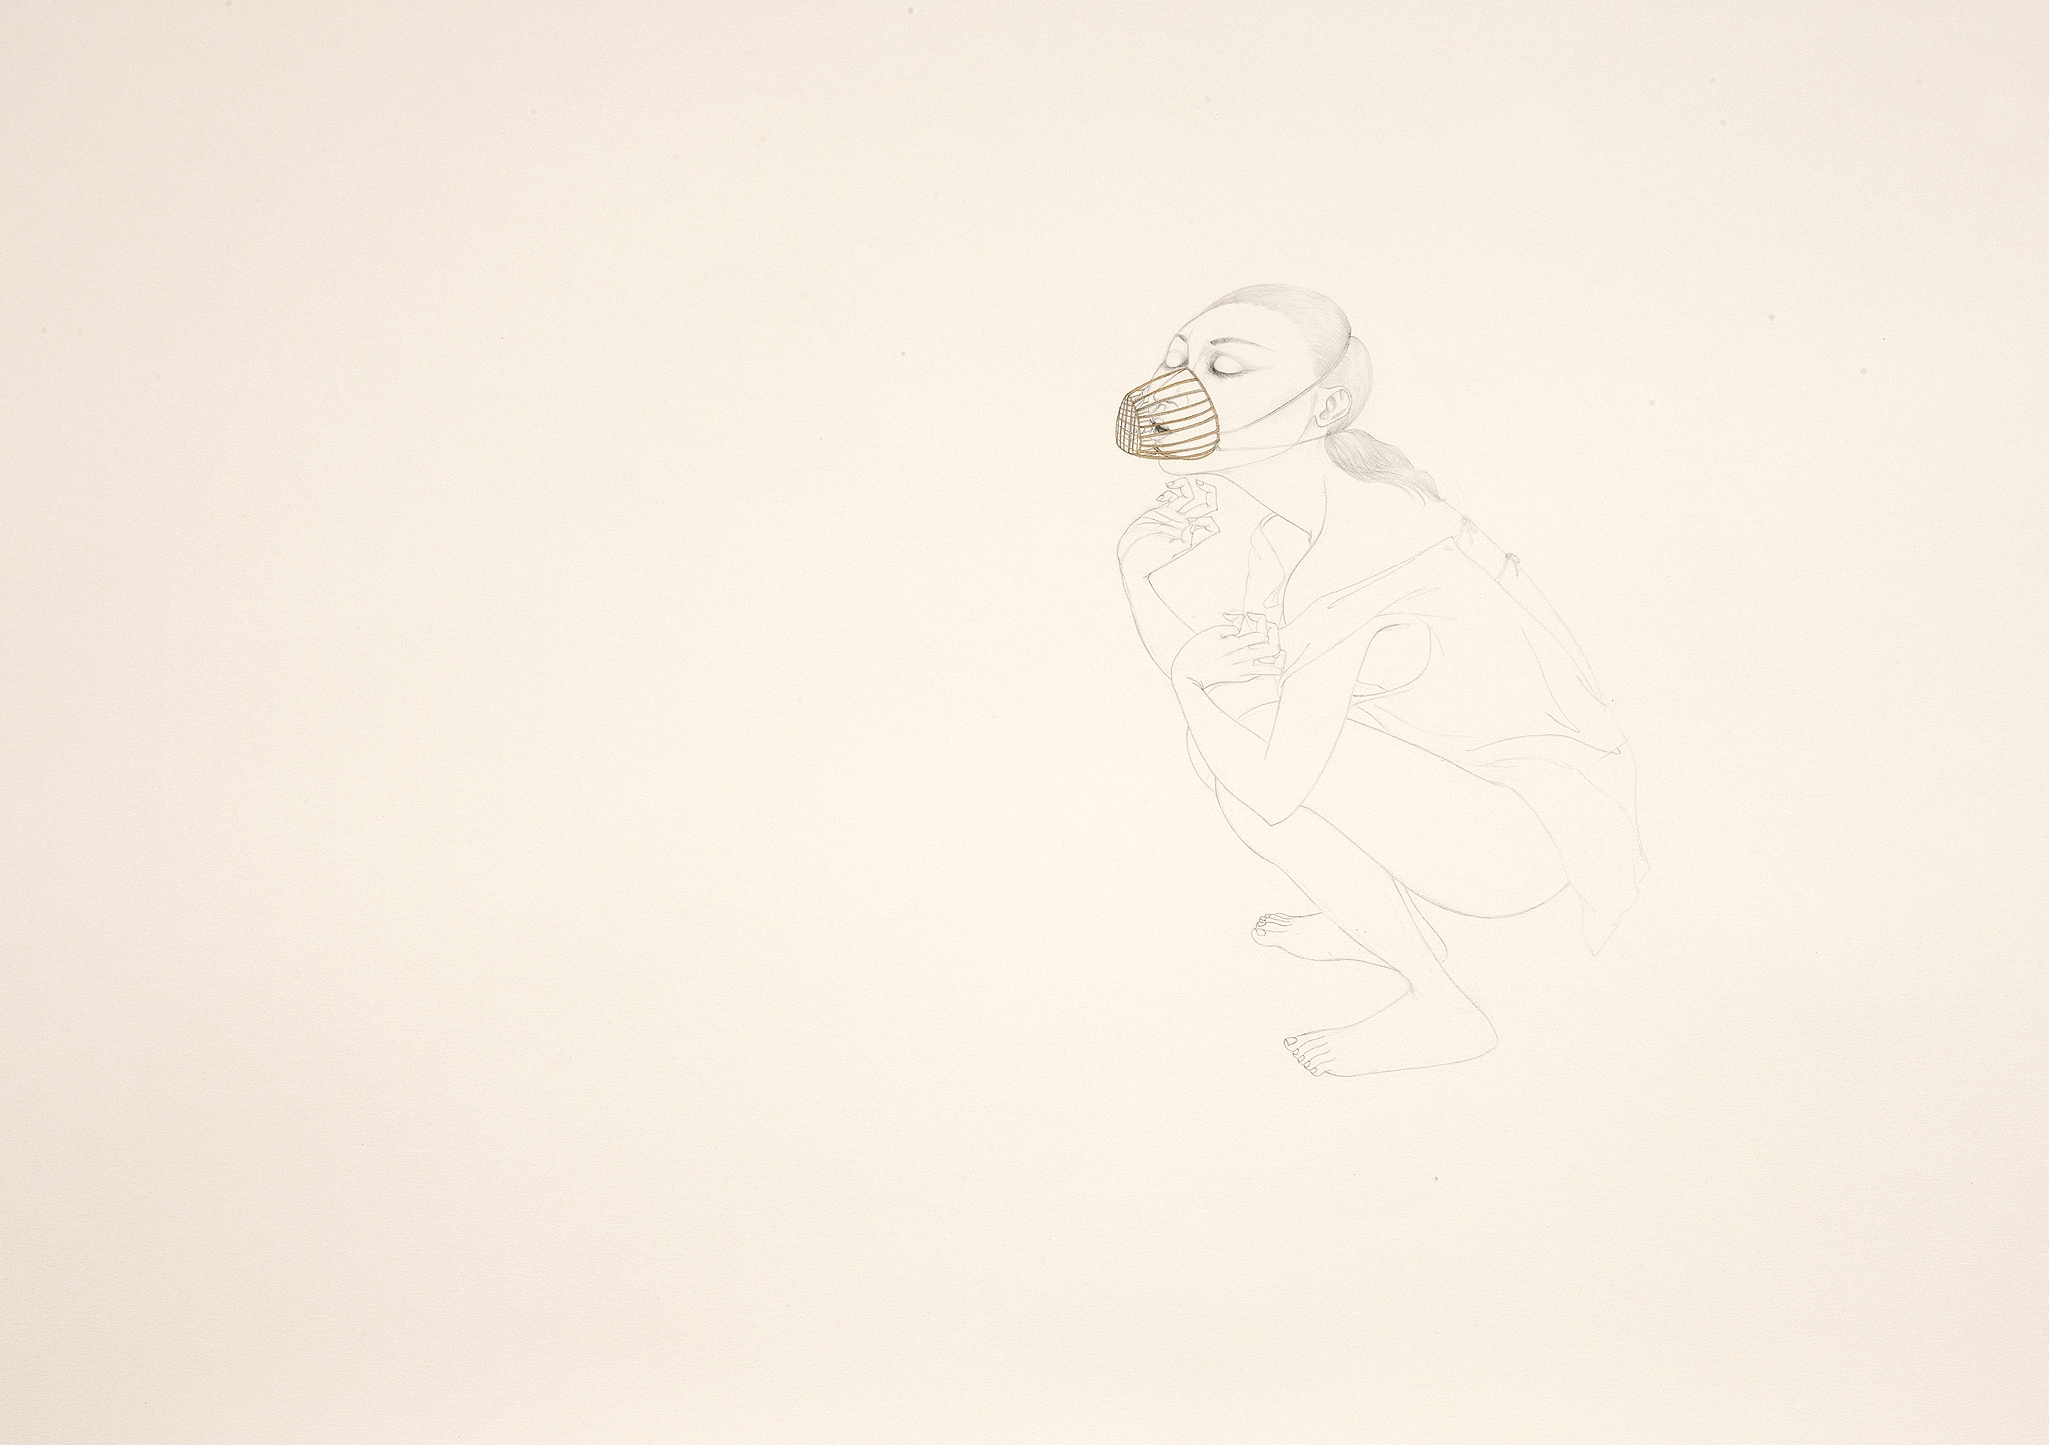 Still Breath , 2011 Graphite, watercolor, metallic color on ivory Fabriana Rossapina 27.5 x 39 inches Photo: Bill Orcutt